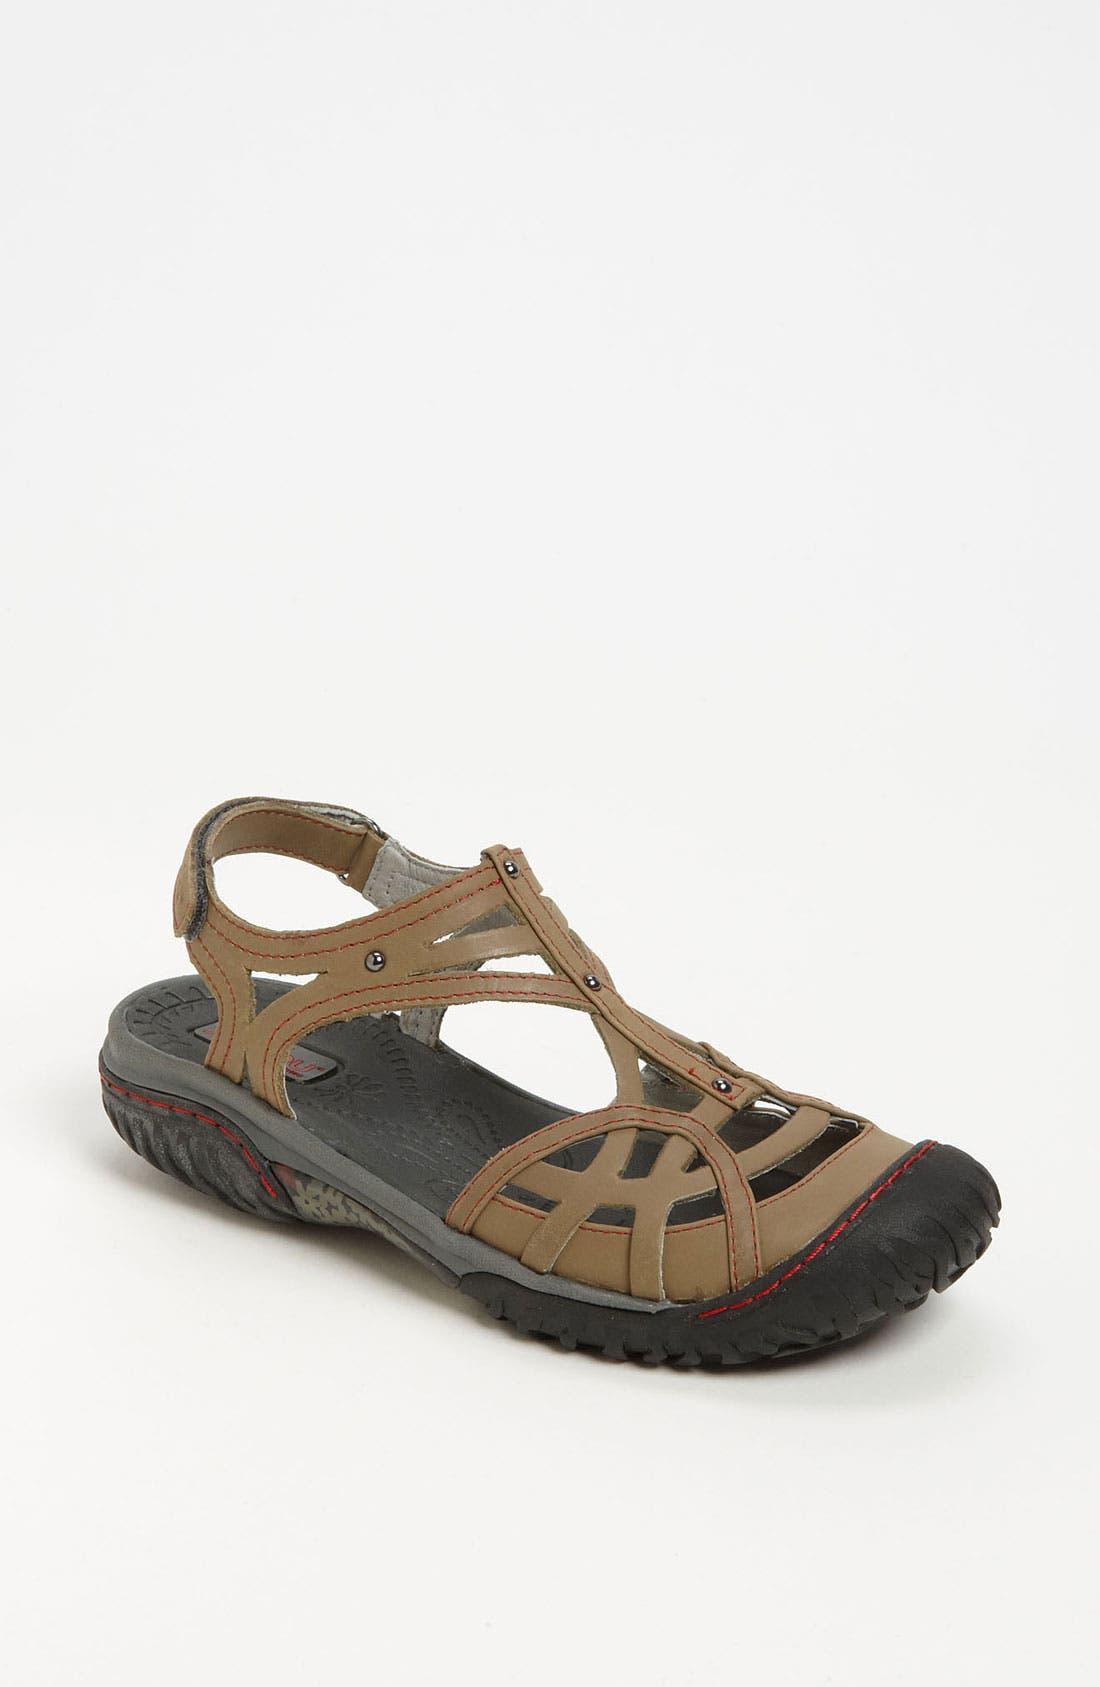 Main Image - Jambu 'All Terra Coconut' Sandal